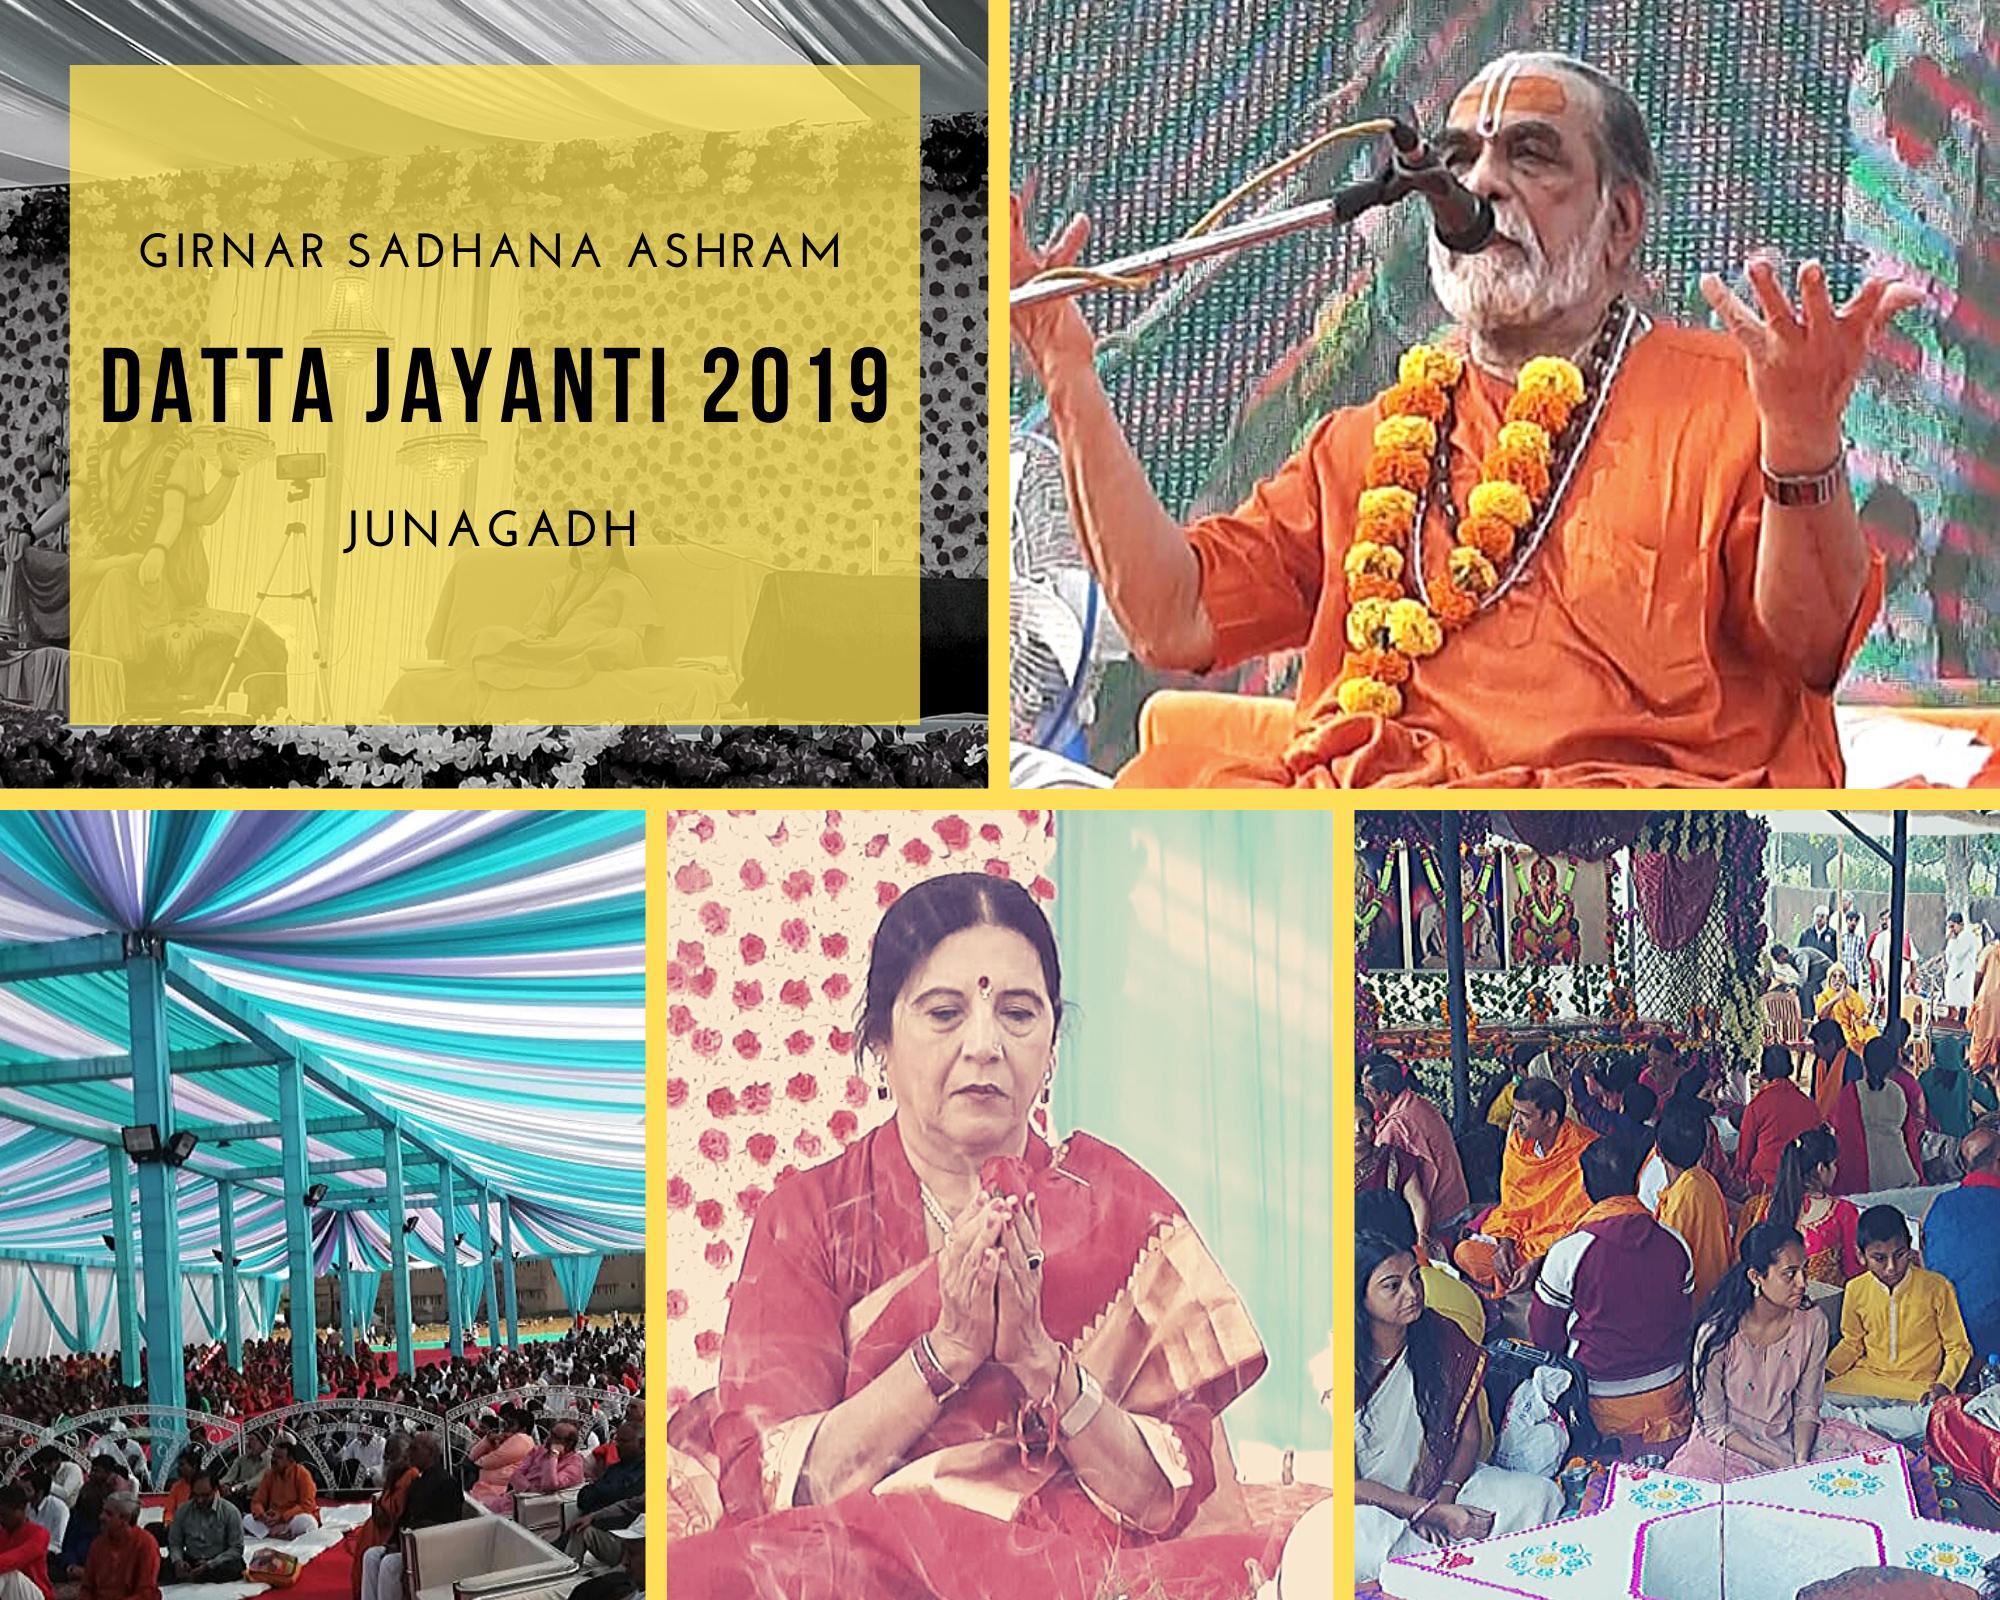 Datta Jayanti 2019